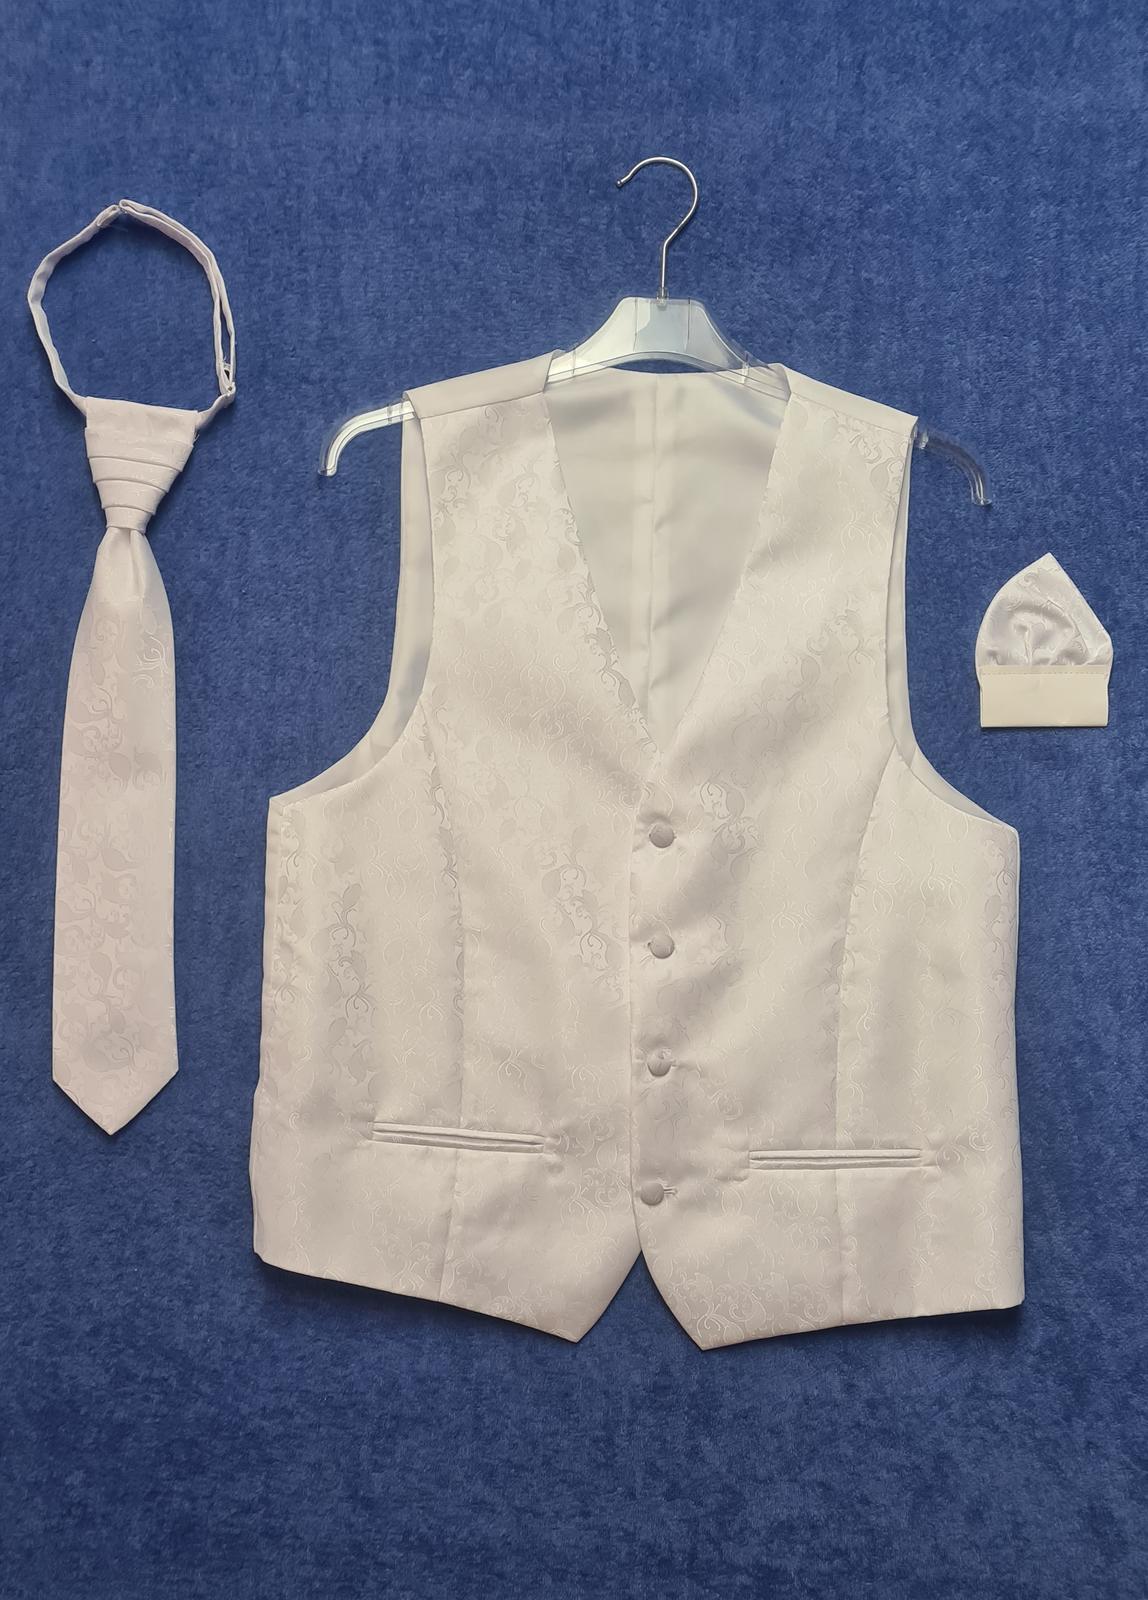 snehobiely set pre zenicha - vesta, kravata, vreckovka v.46 - Obrázok č. 1